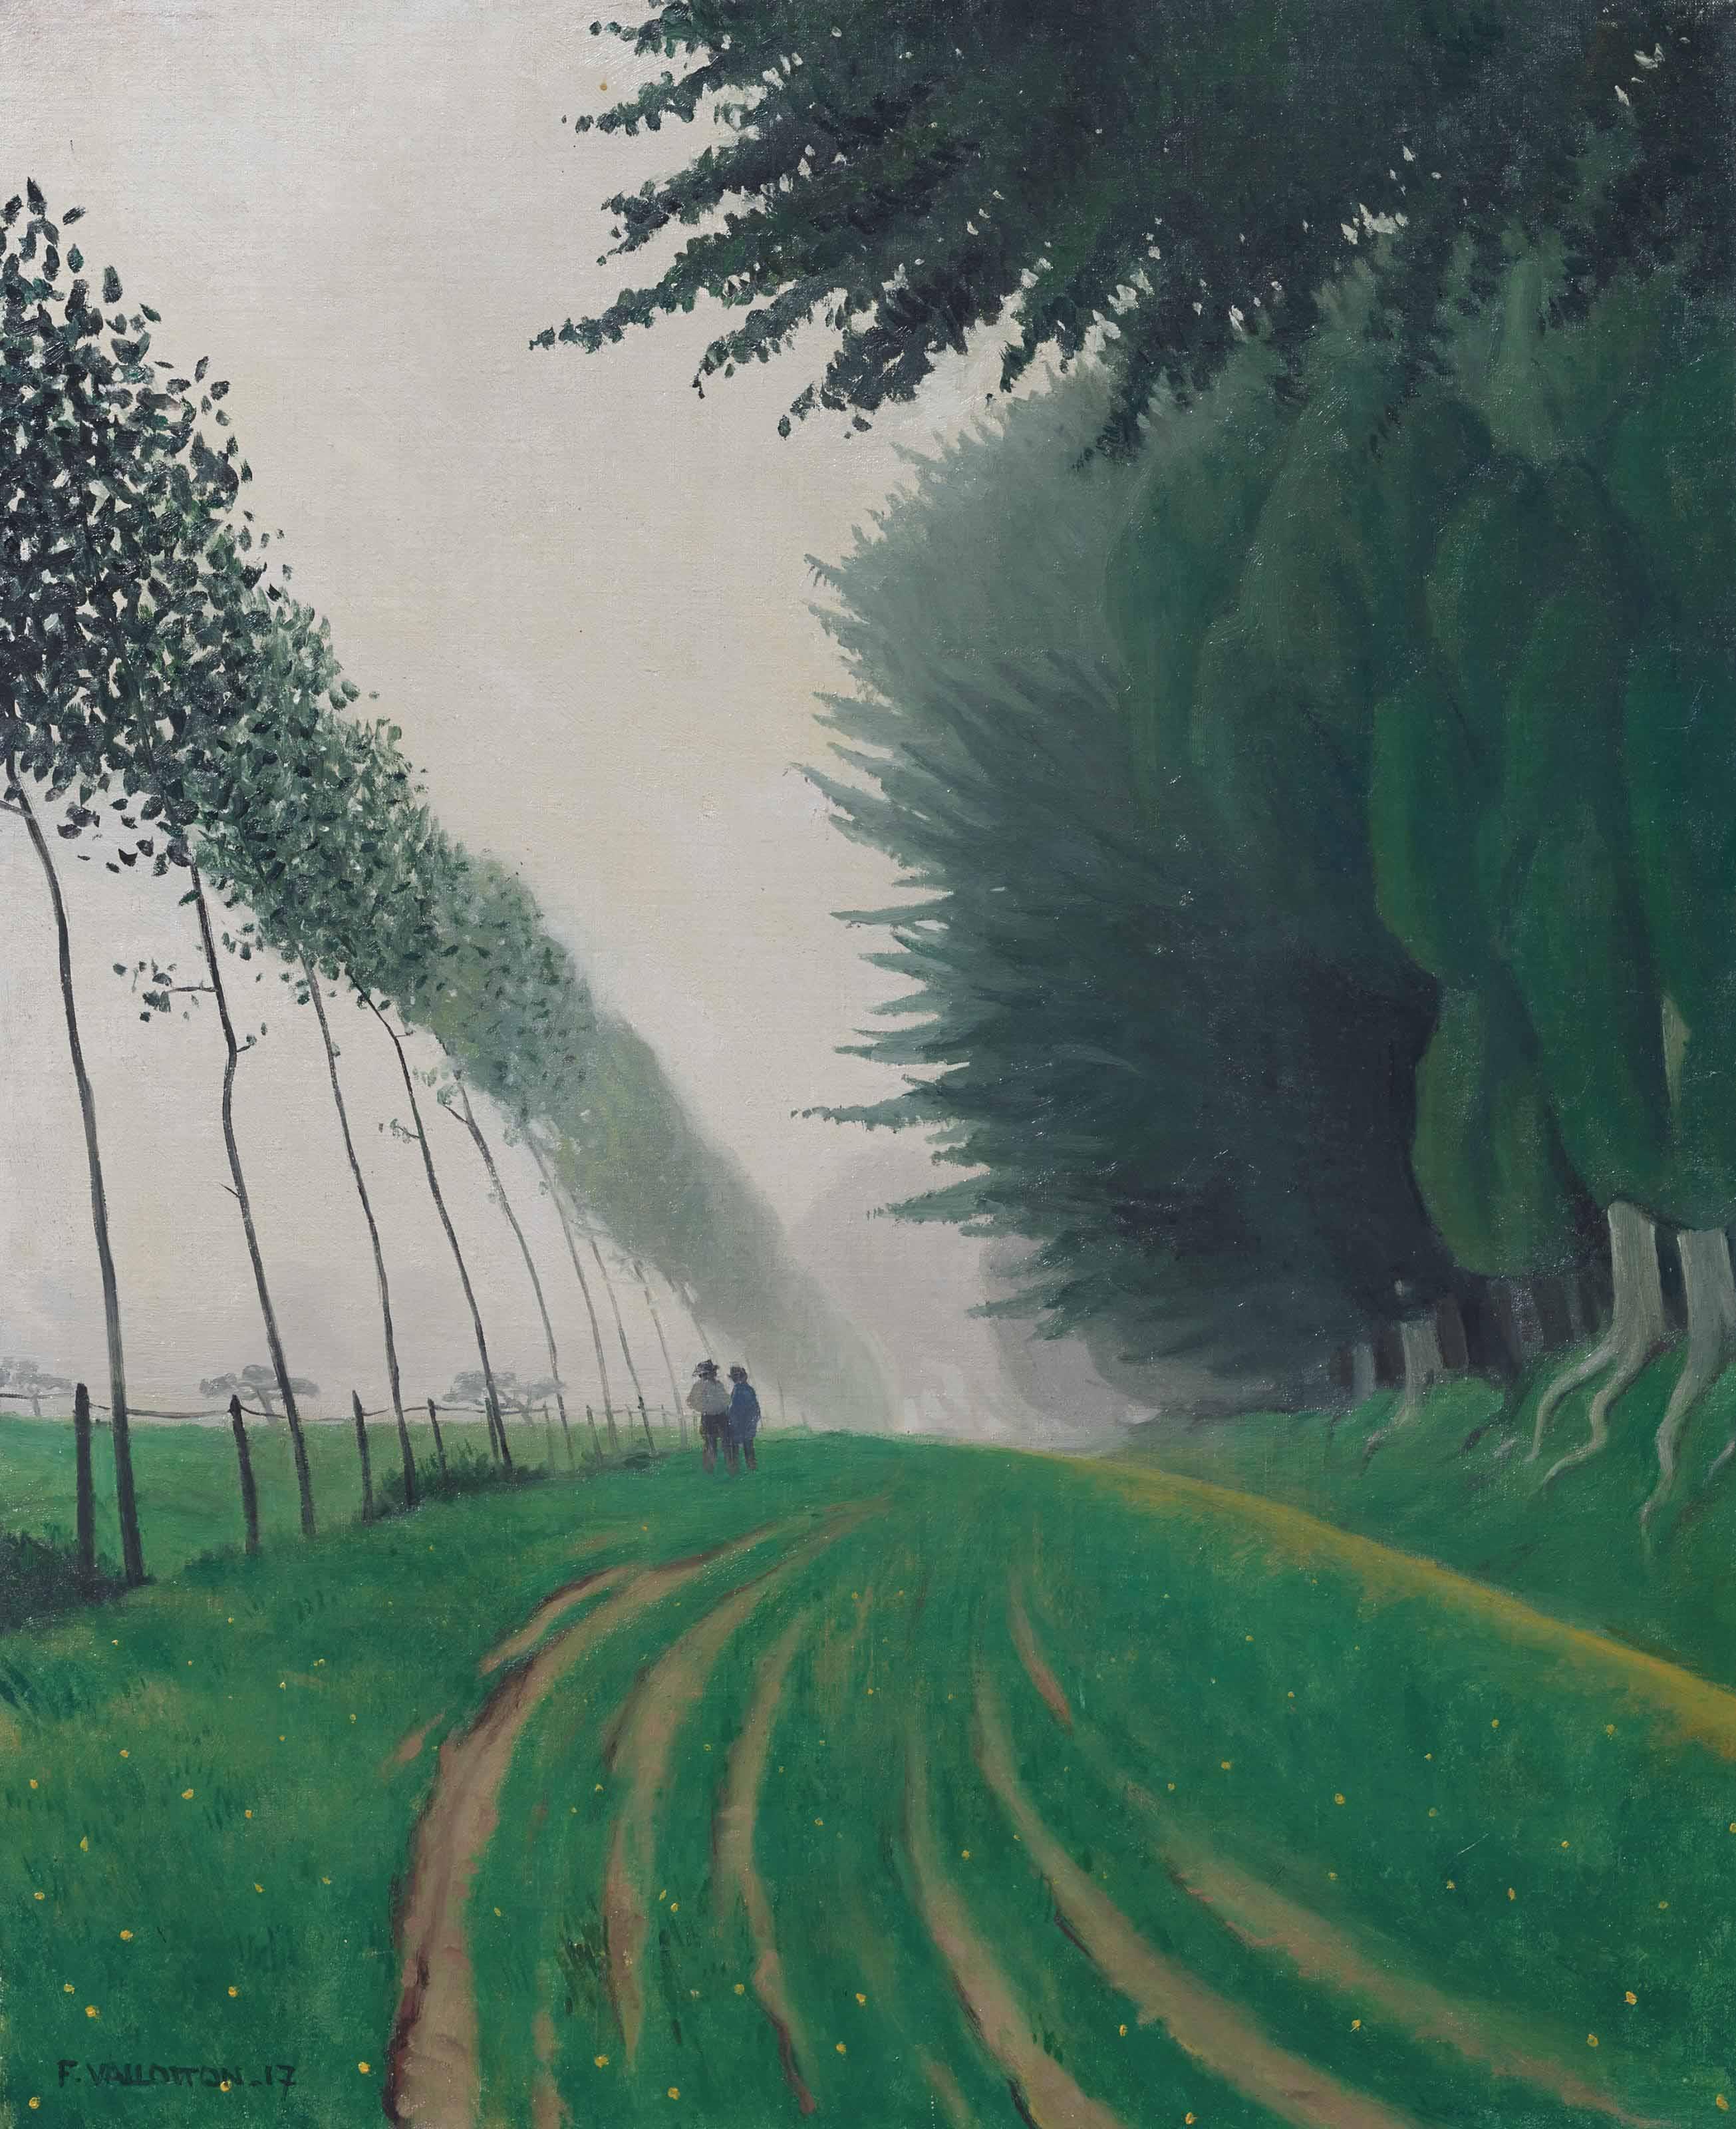 Effet de brume, Honfleur, 1917